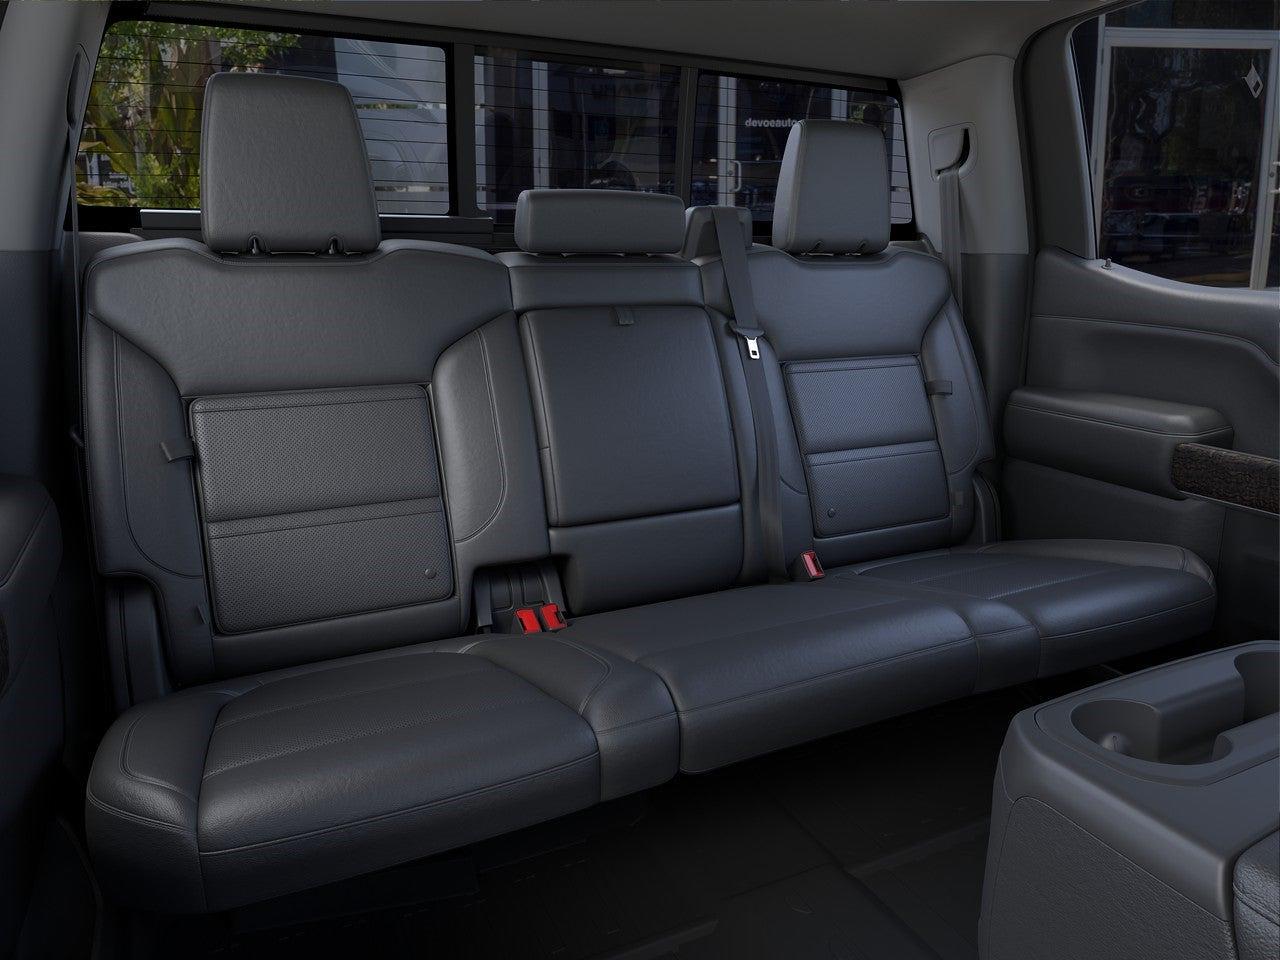 2021 GMC Sierra 1500 Crew Cab 4x2, Pickup #T21242 - photo 34